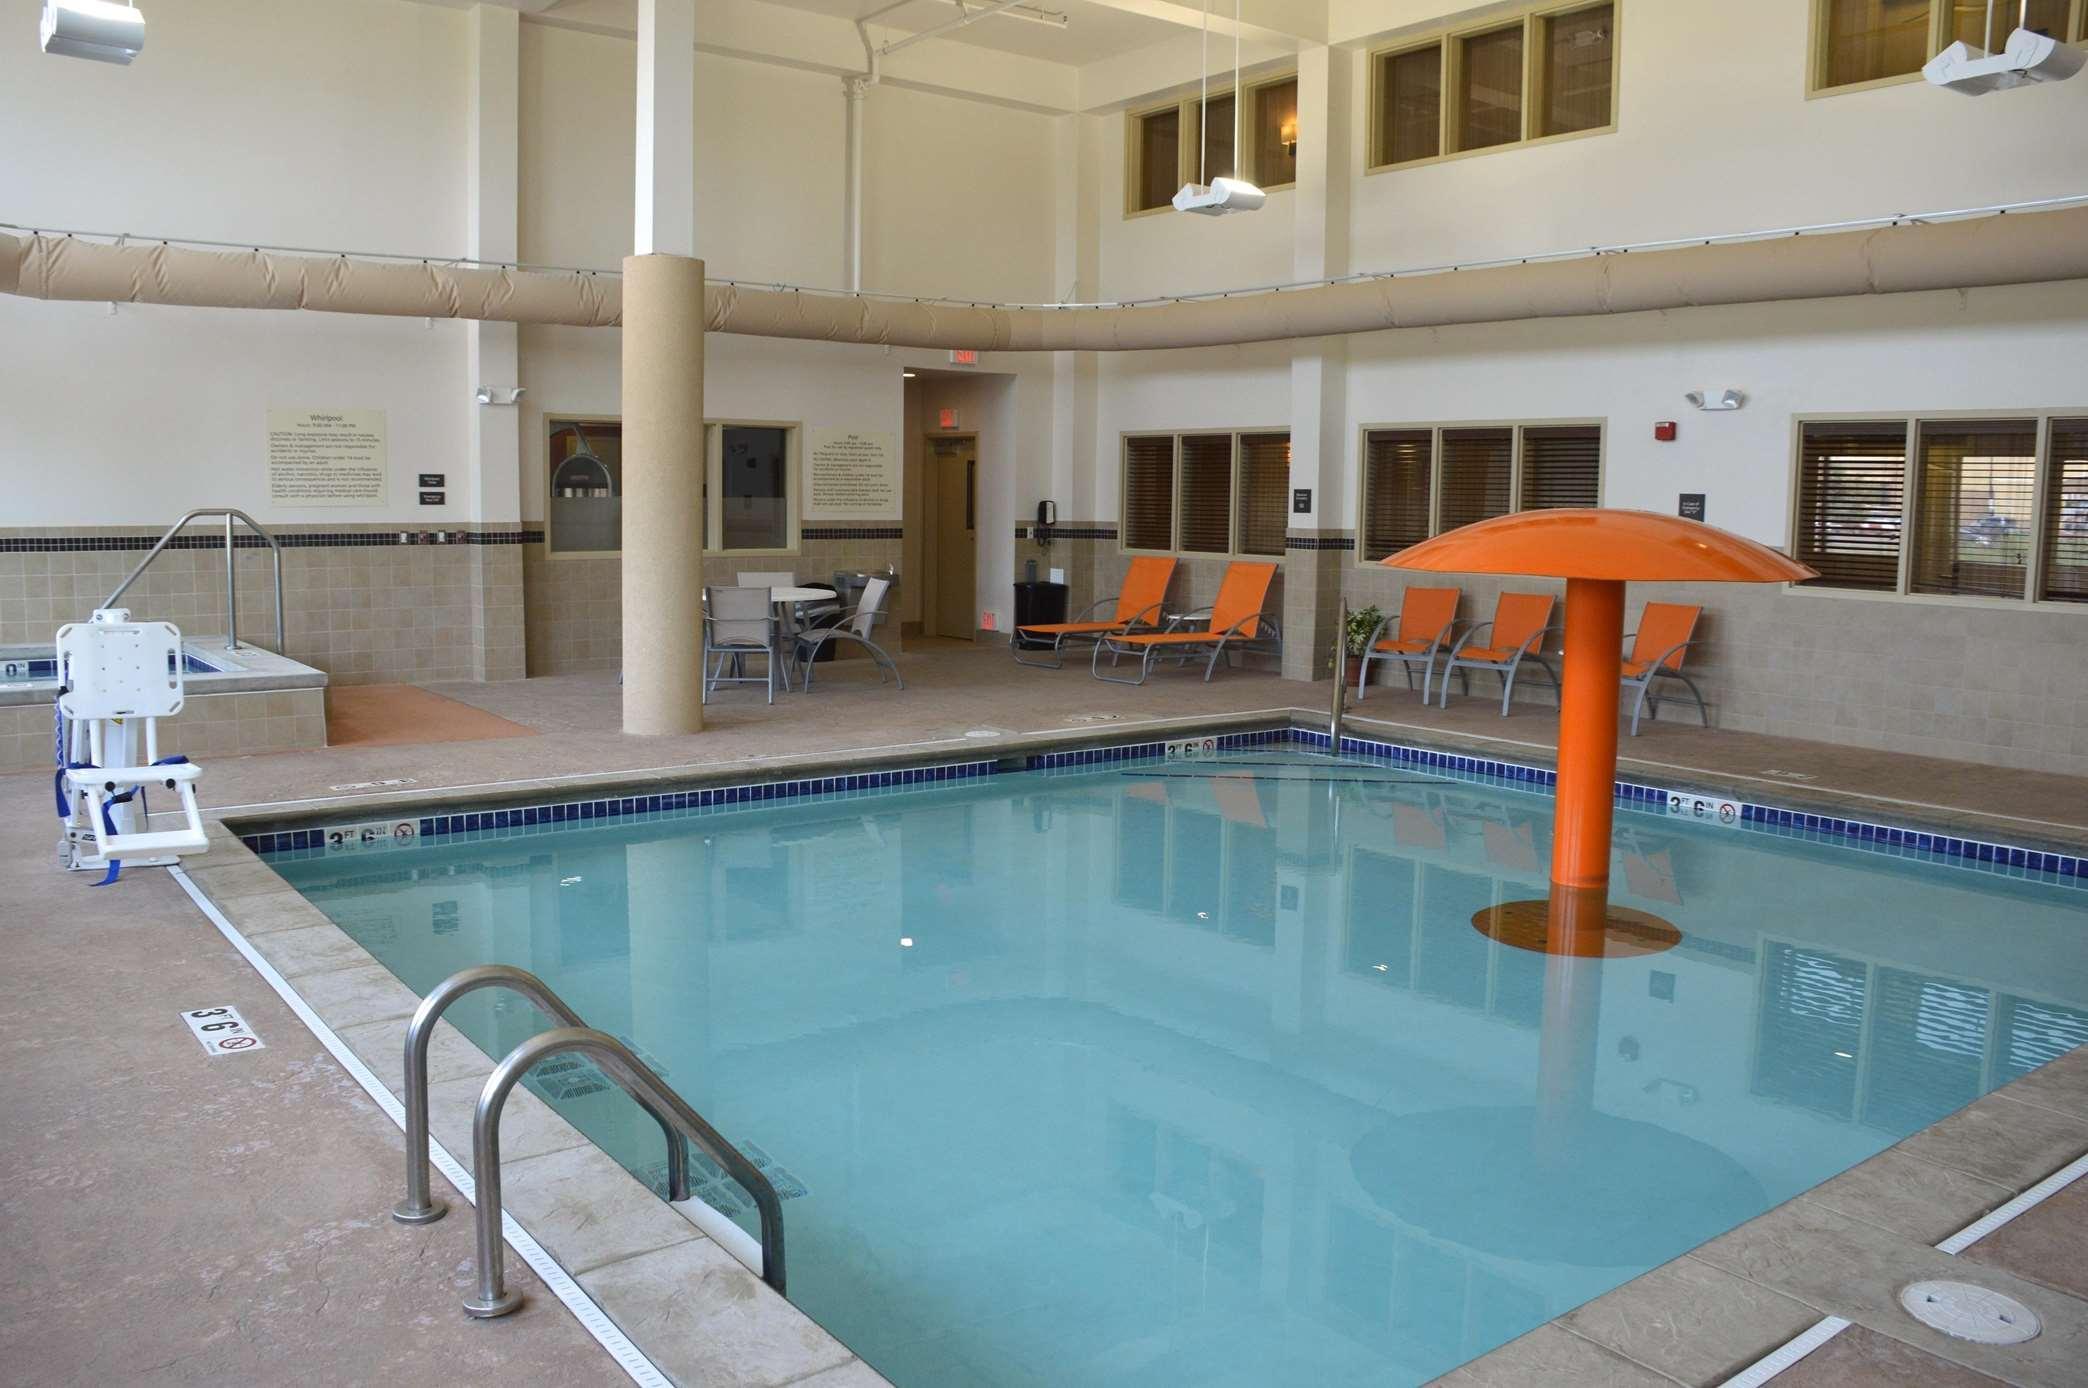 Hampton Inn & Suites Jamestown, ND image 18